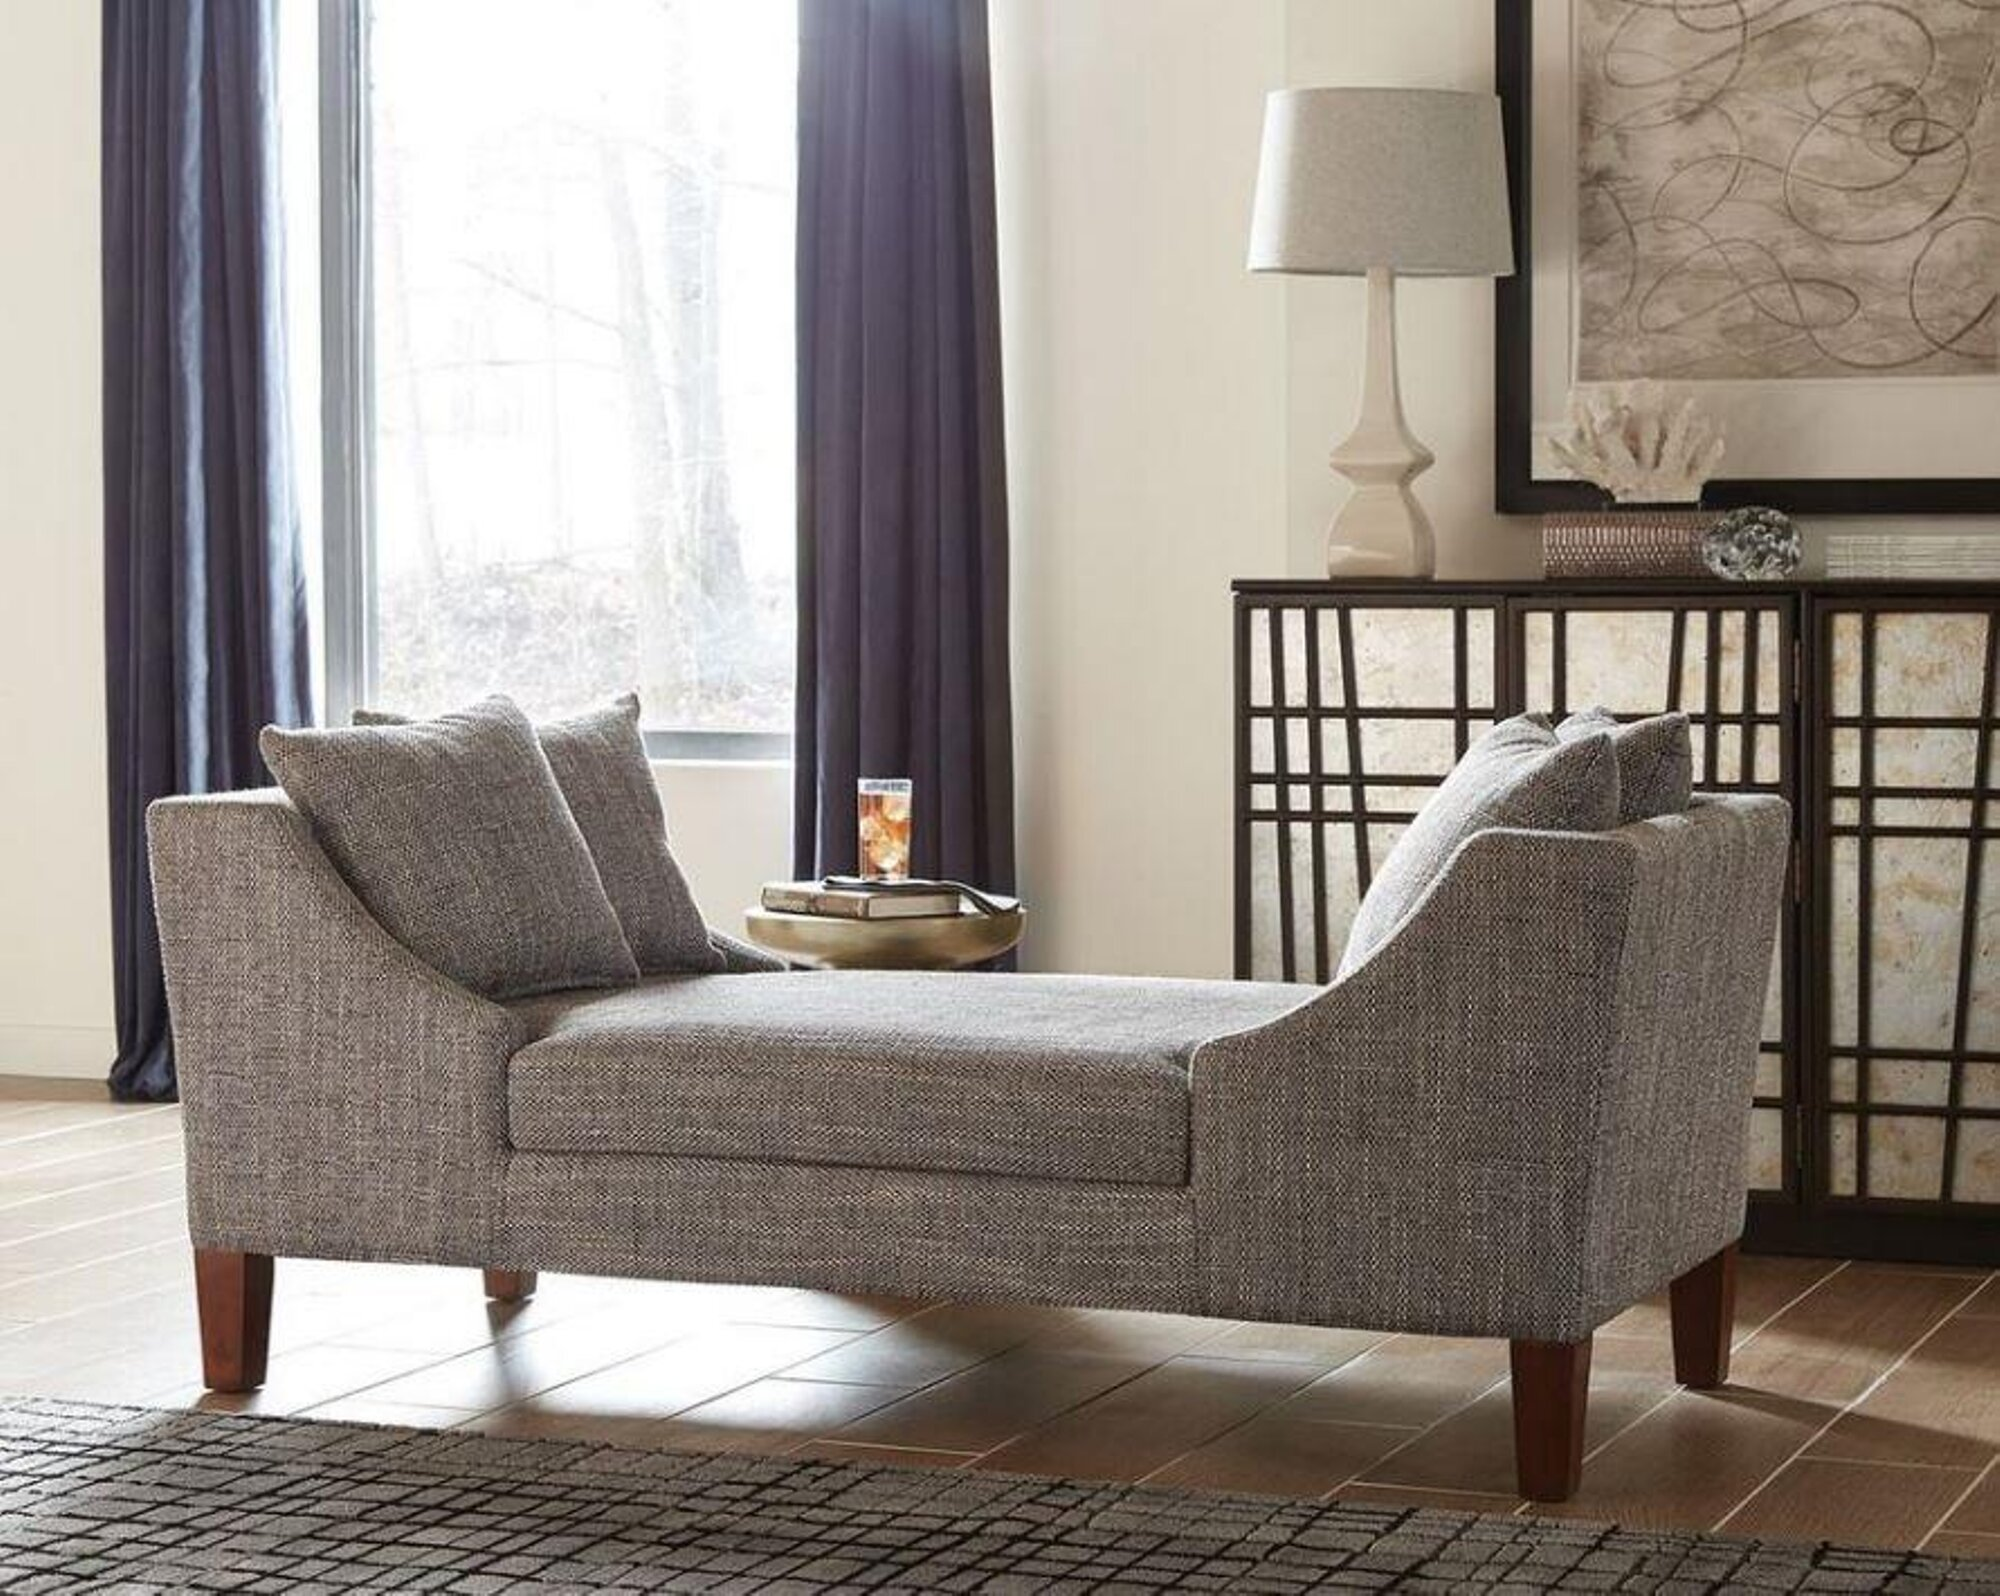 SCTL Chaise Lounge & Reviews | Wayfair